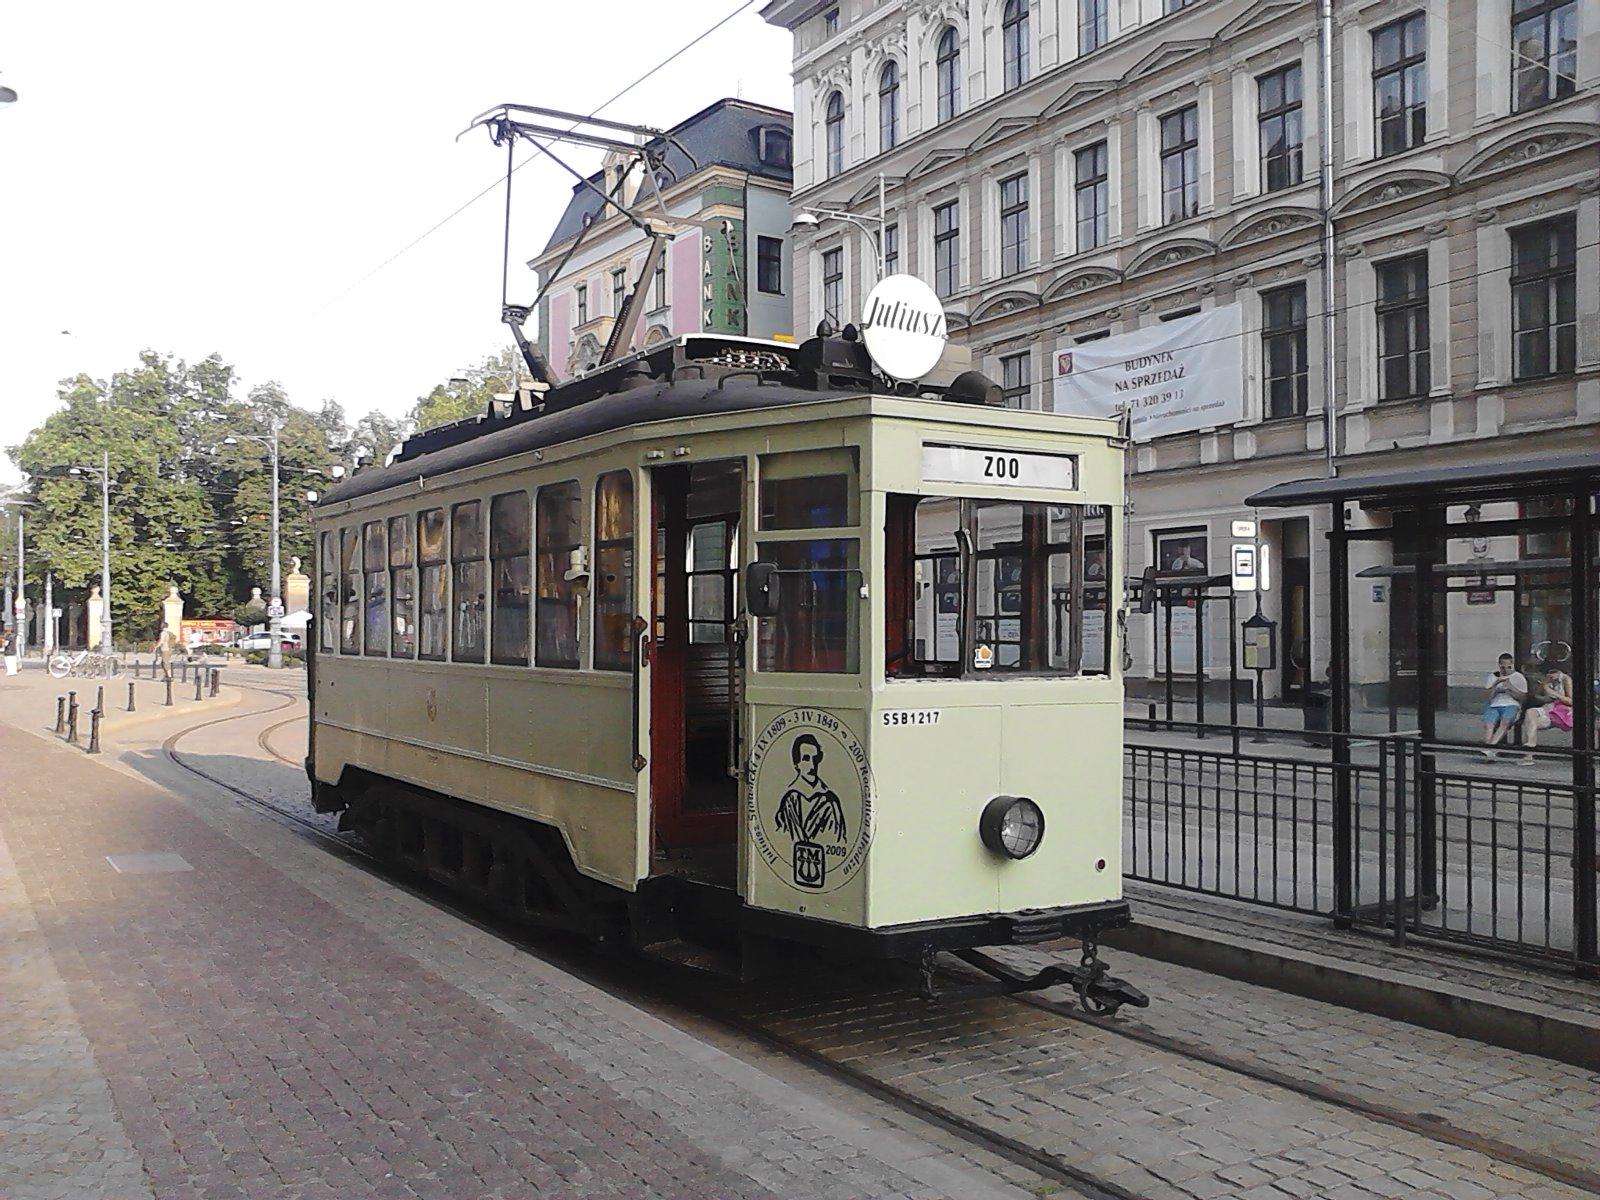 Tram in wroclaw photo